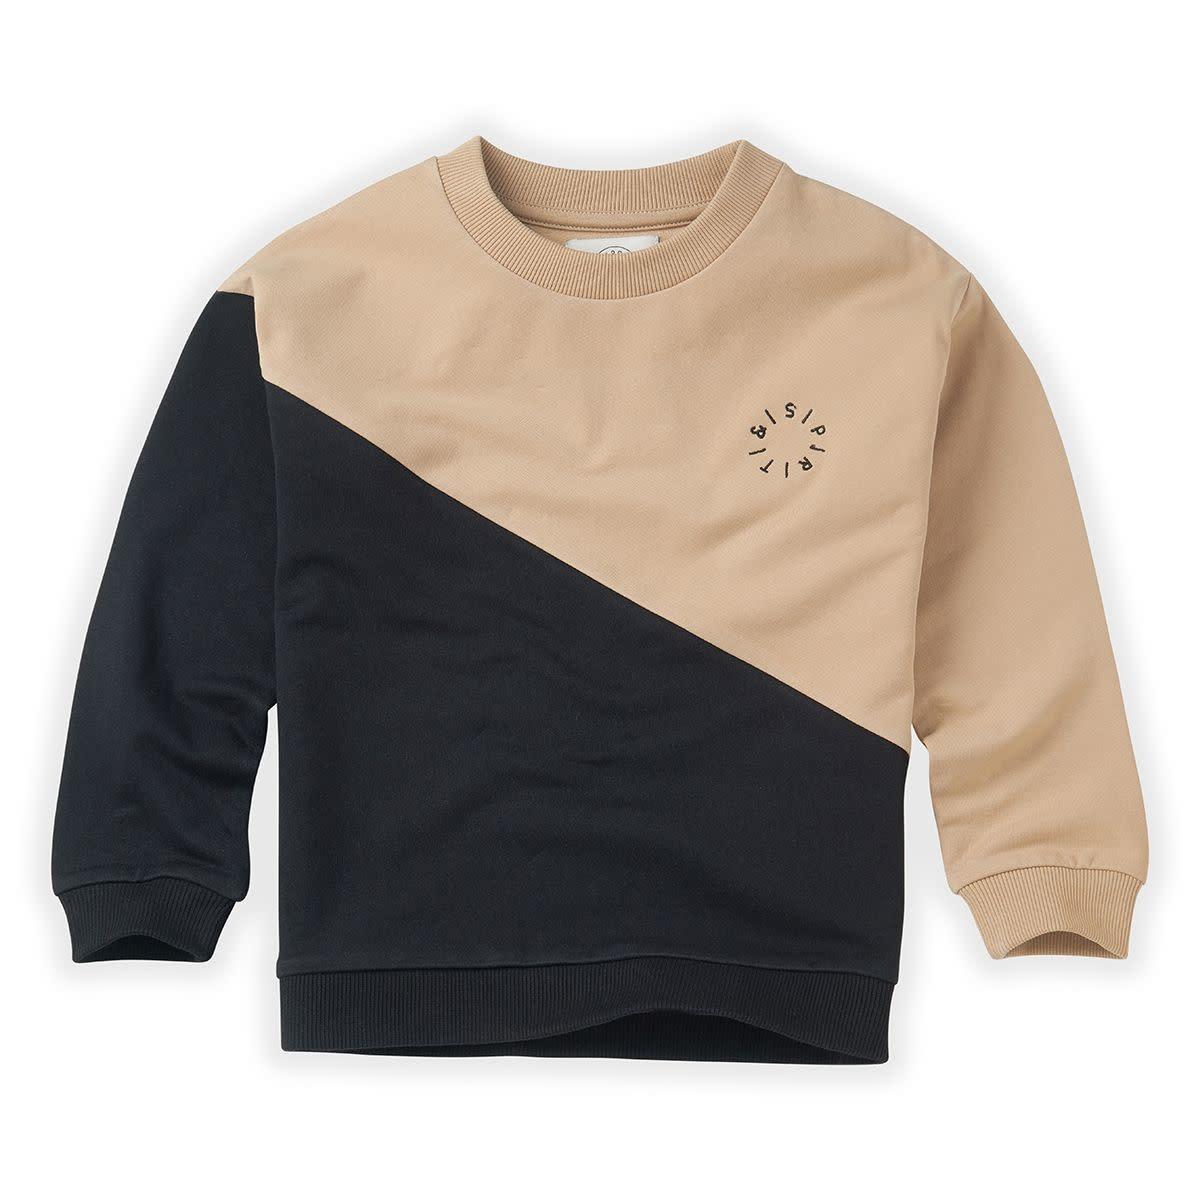 Sproet & Sprout Sproet&Sprout - Sweatshirt colourblock black/nougat